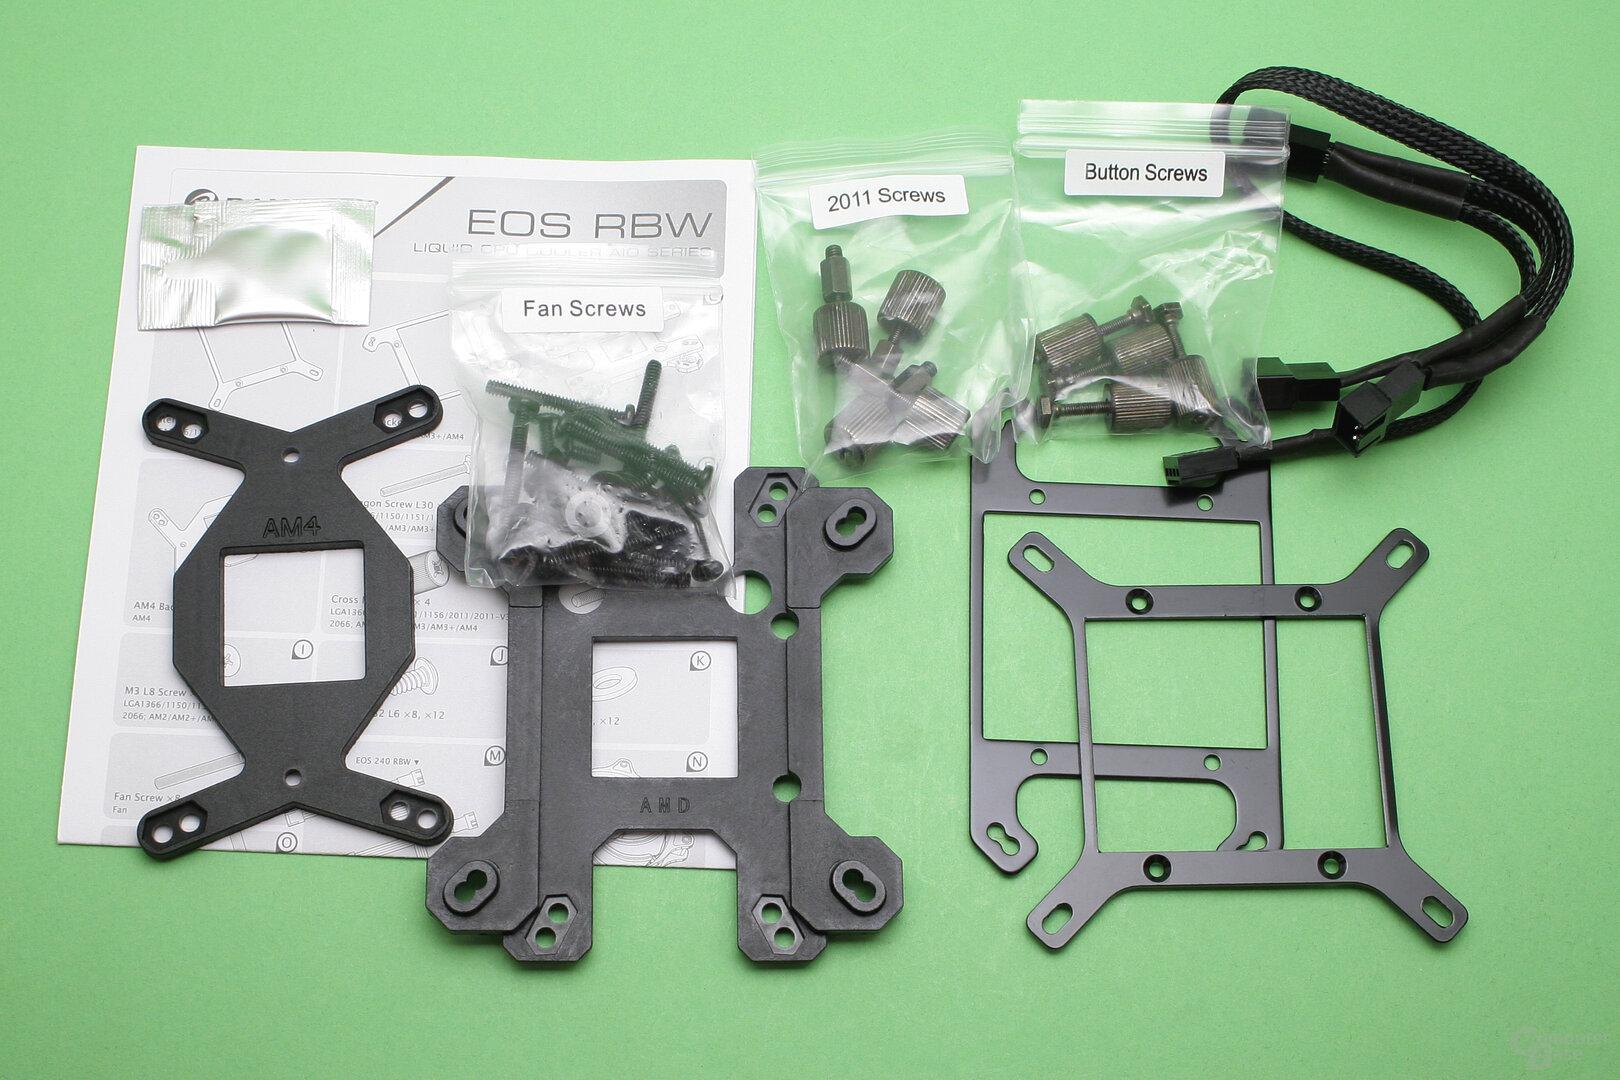 Raijintek EOS 360 RBW: Lieferumfang